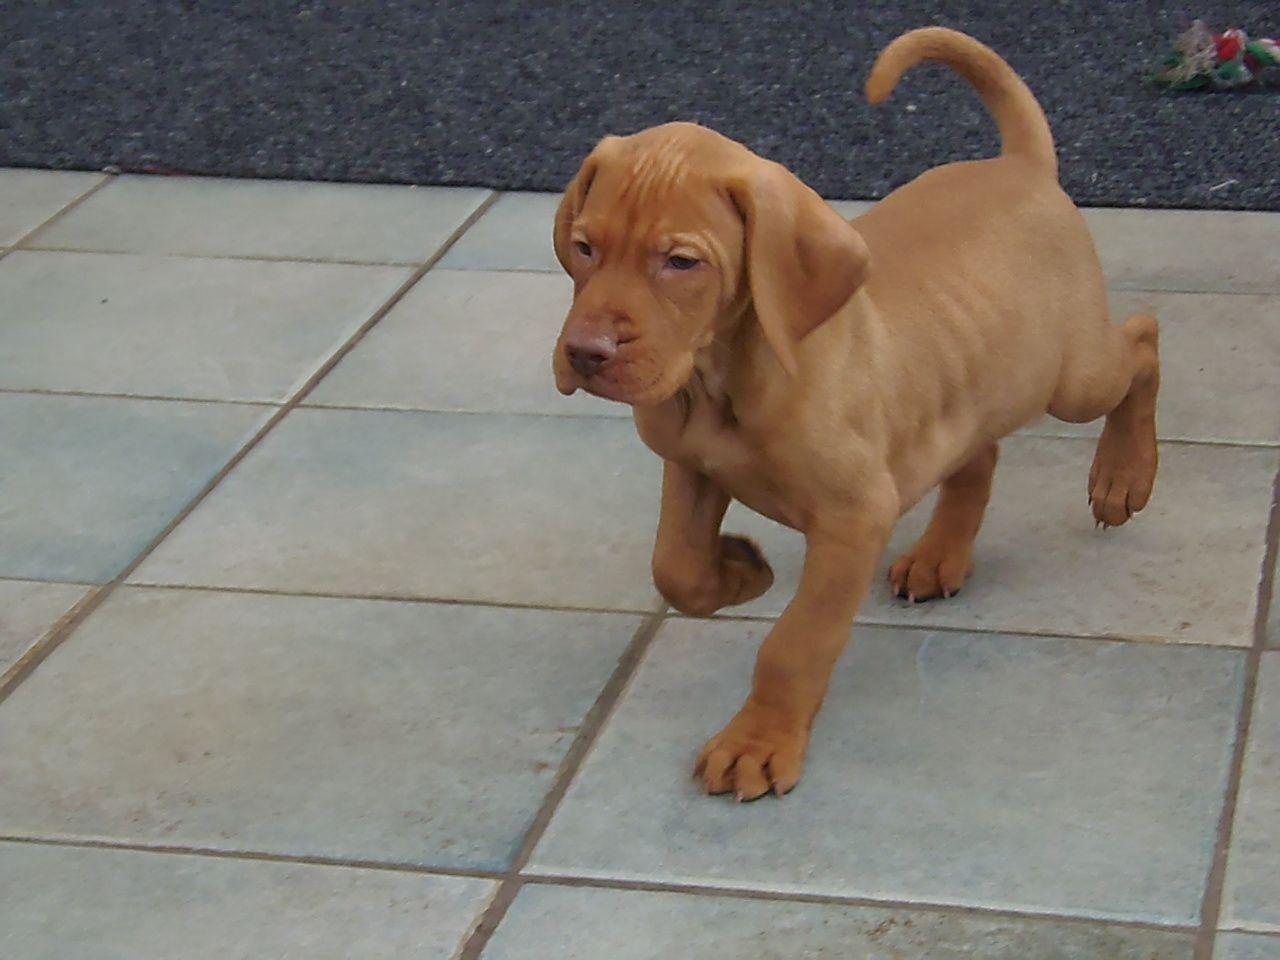 Hungarian Vizsla Puppies For Sale Carlisle Cumbria Pets4homes Vizsla Puppies For Sale Vizsla Puppies For Sale